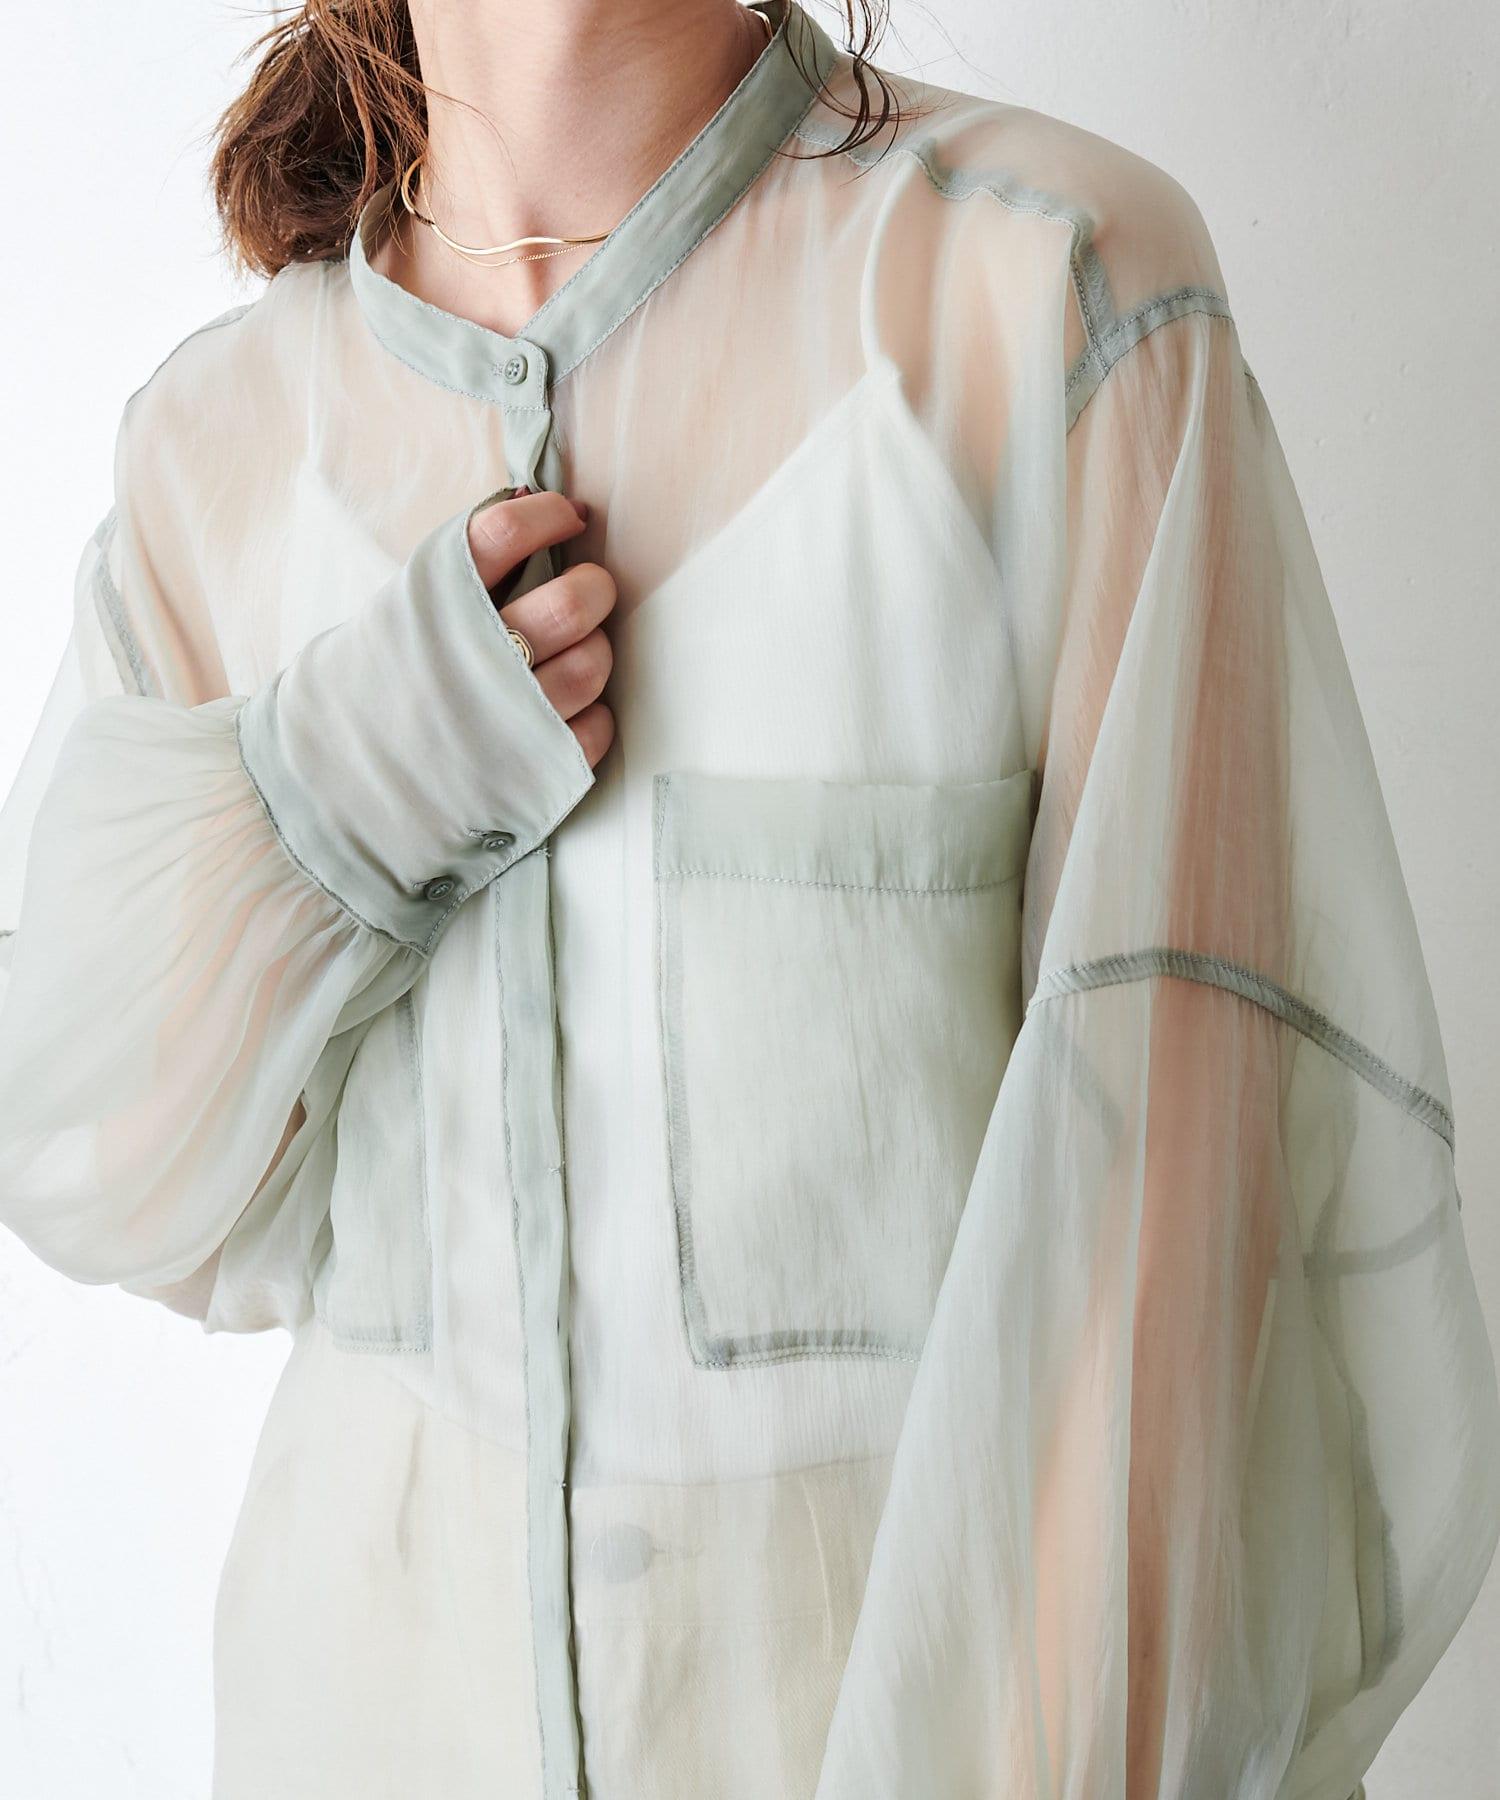 Discoat(ディスコート) シアーロングシャツ